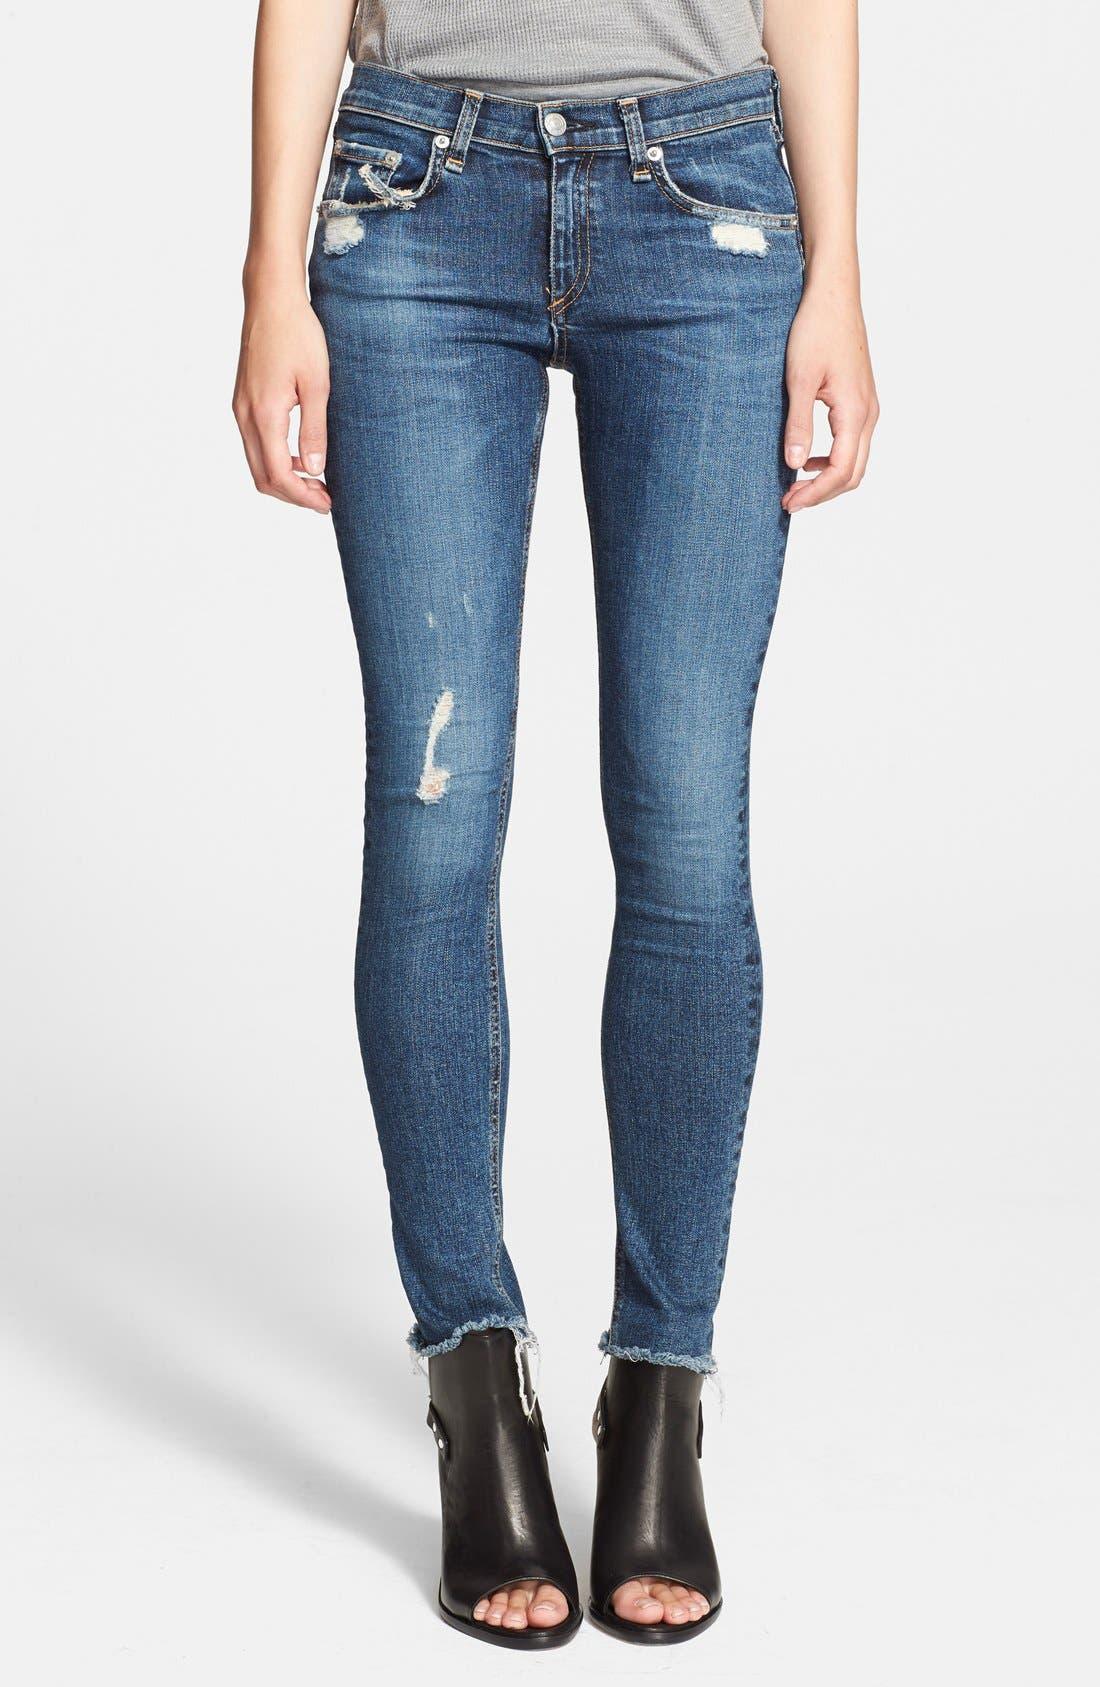 Main Image - rag & bone/JEAN 'The Skinny' Stretch Jeans (La Paz)